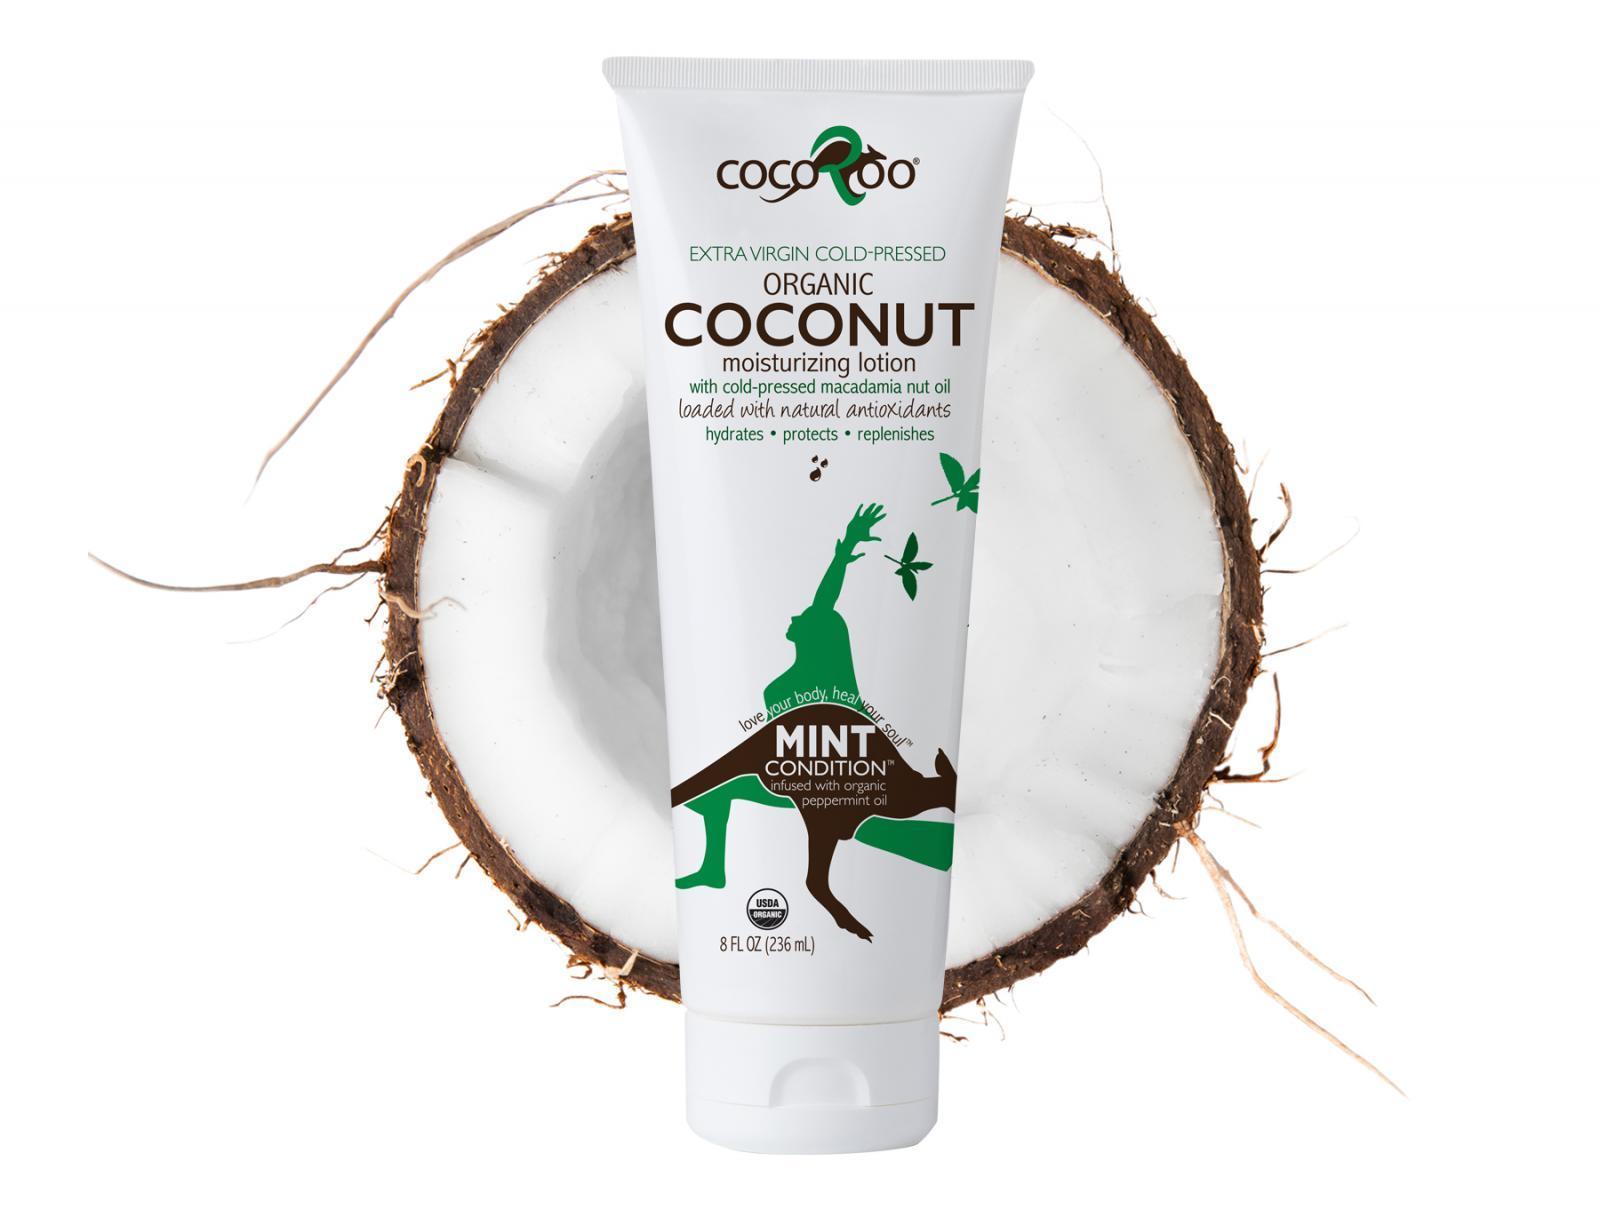 Mint Condition Coconut Oil Moisturizer